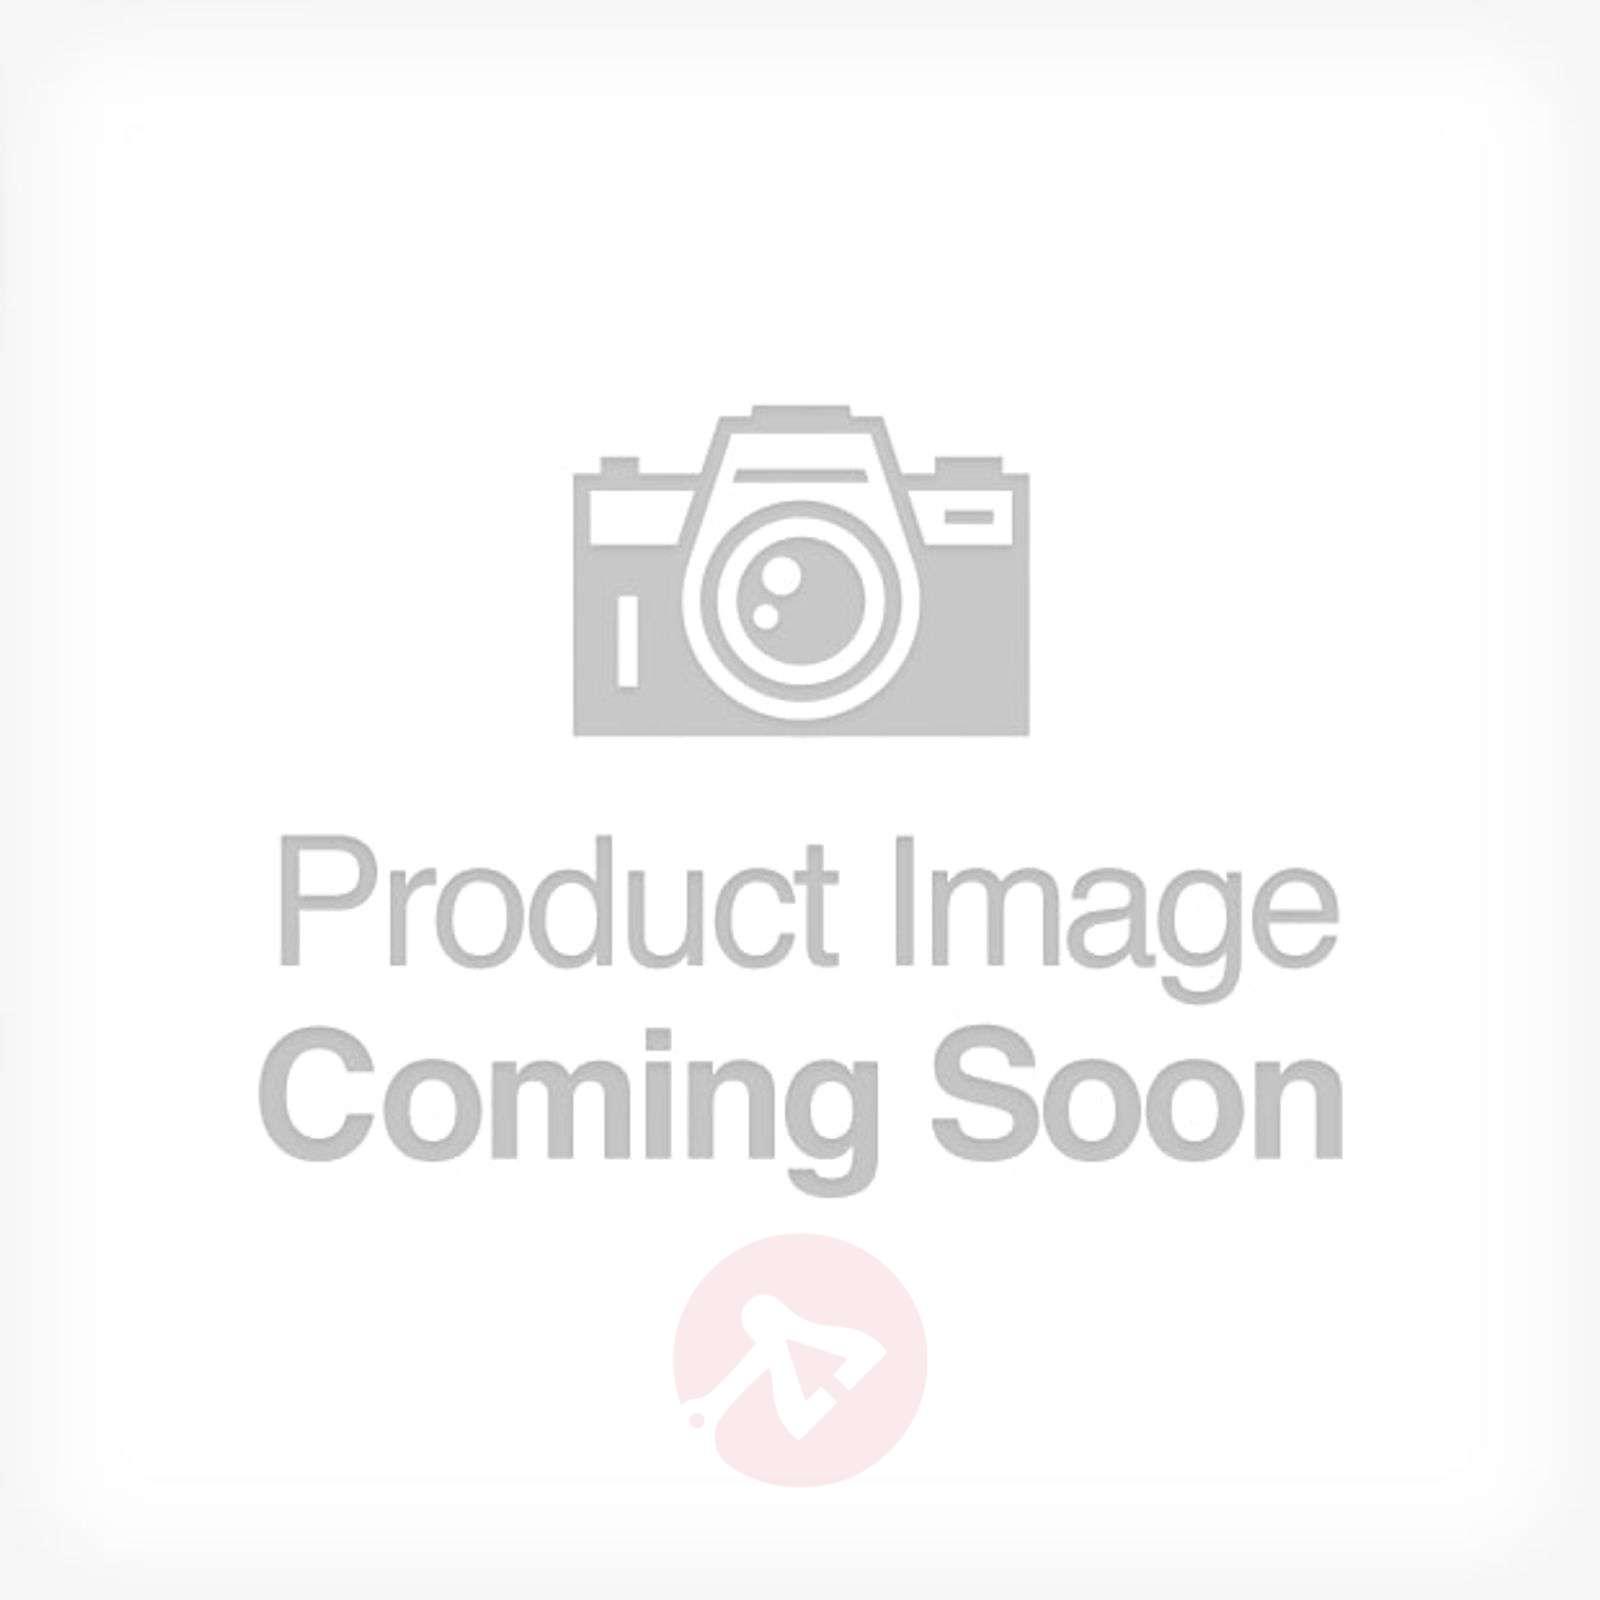 Goya Short Picture Wall Light Stylish-1020254X-04